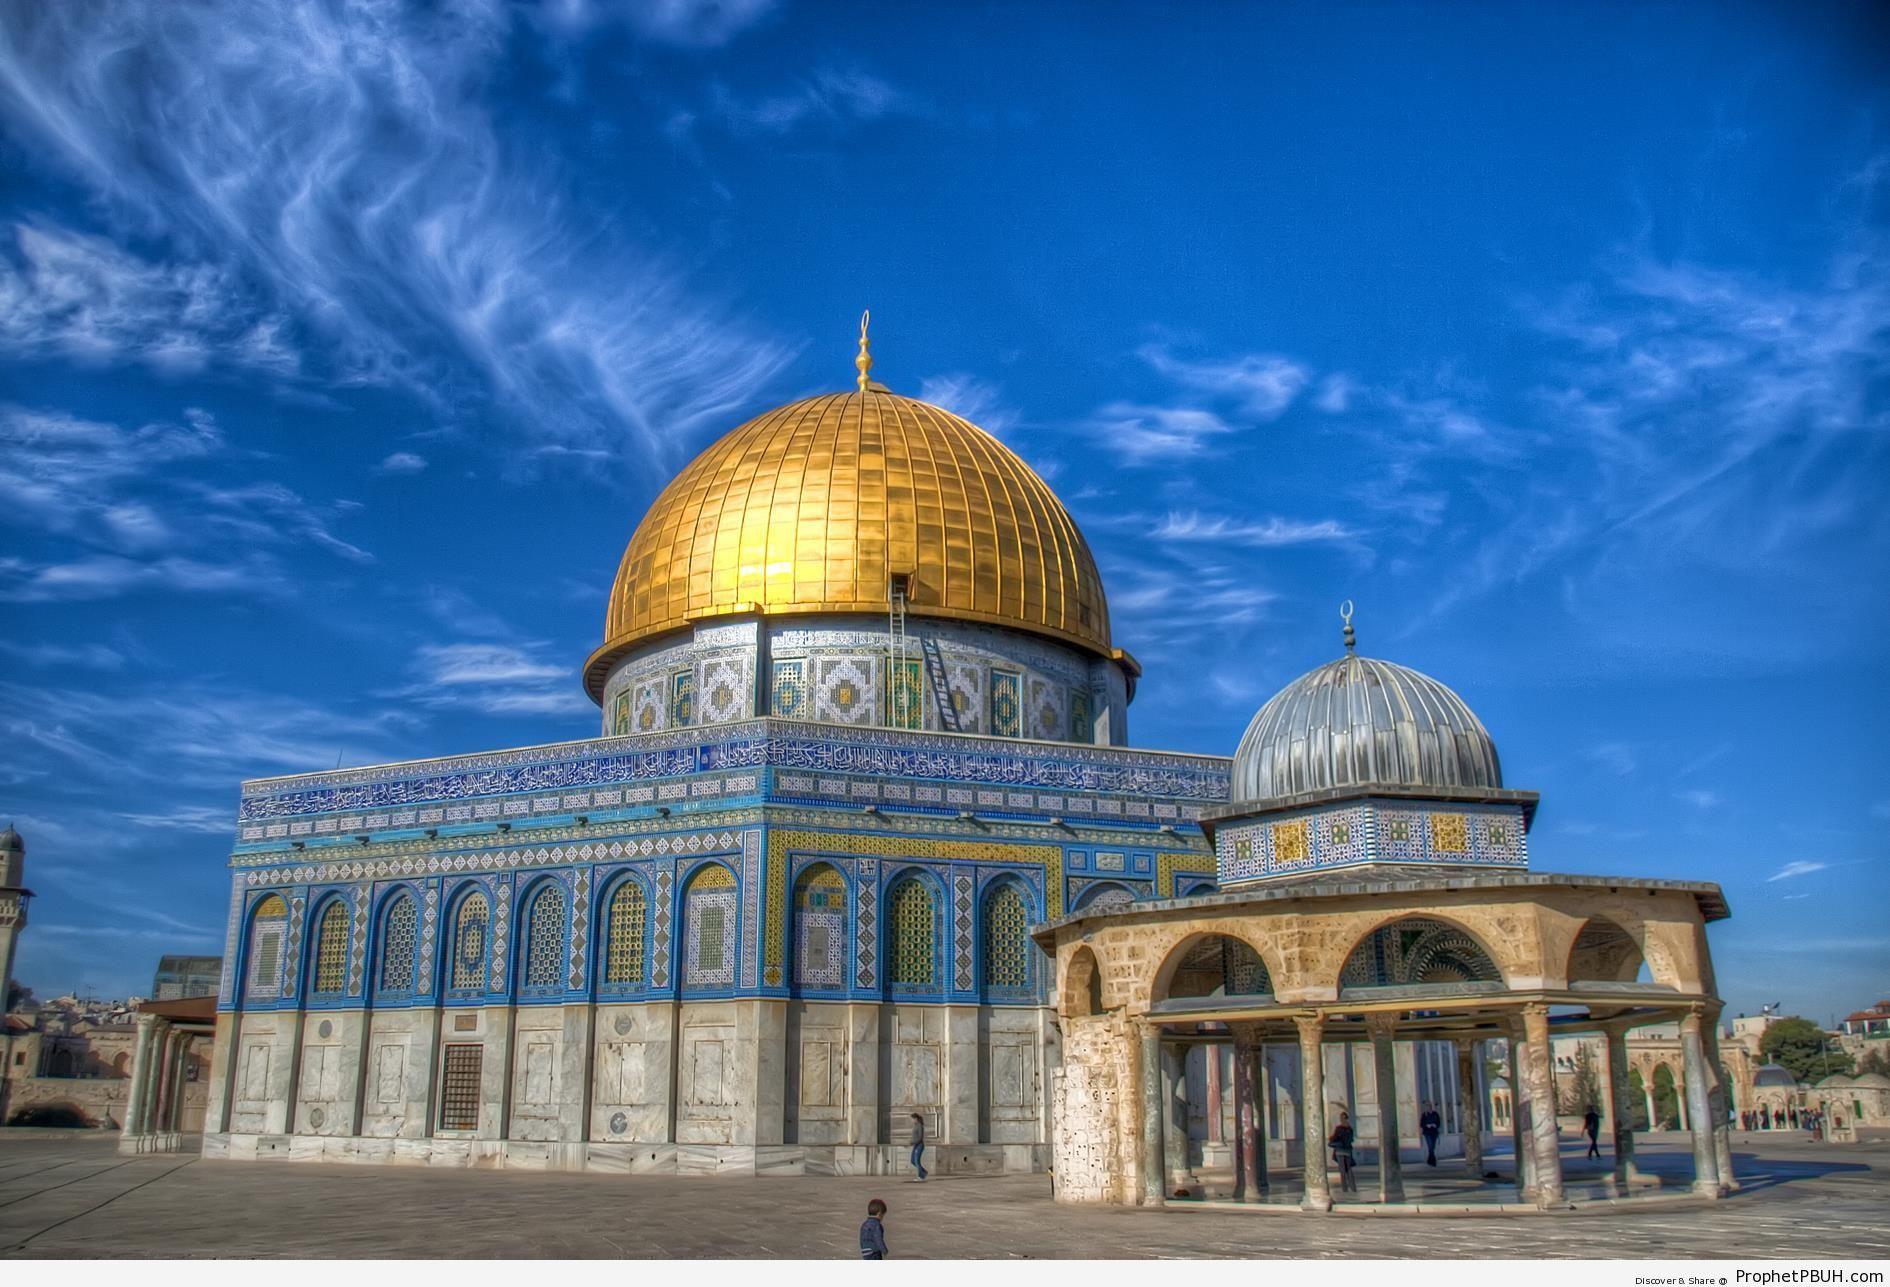 Dome of the Rock Mosque on Deep Blue Sky - Al-Quds (Jerusalem), Palestine -Picture